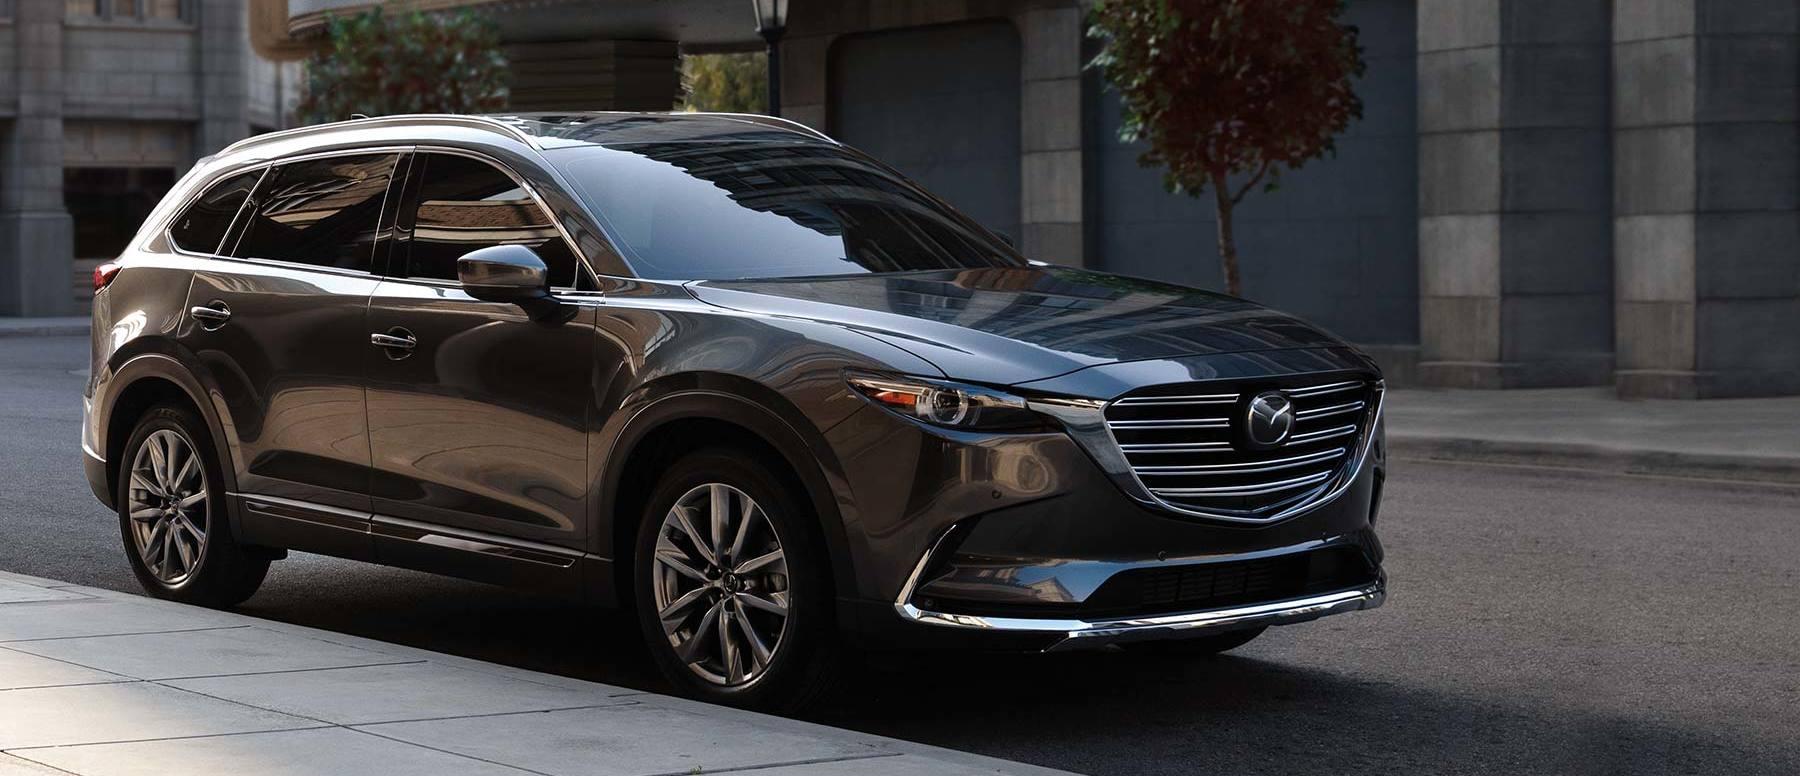 2019 Mazda CX-9 Leasing near Novi, MI